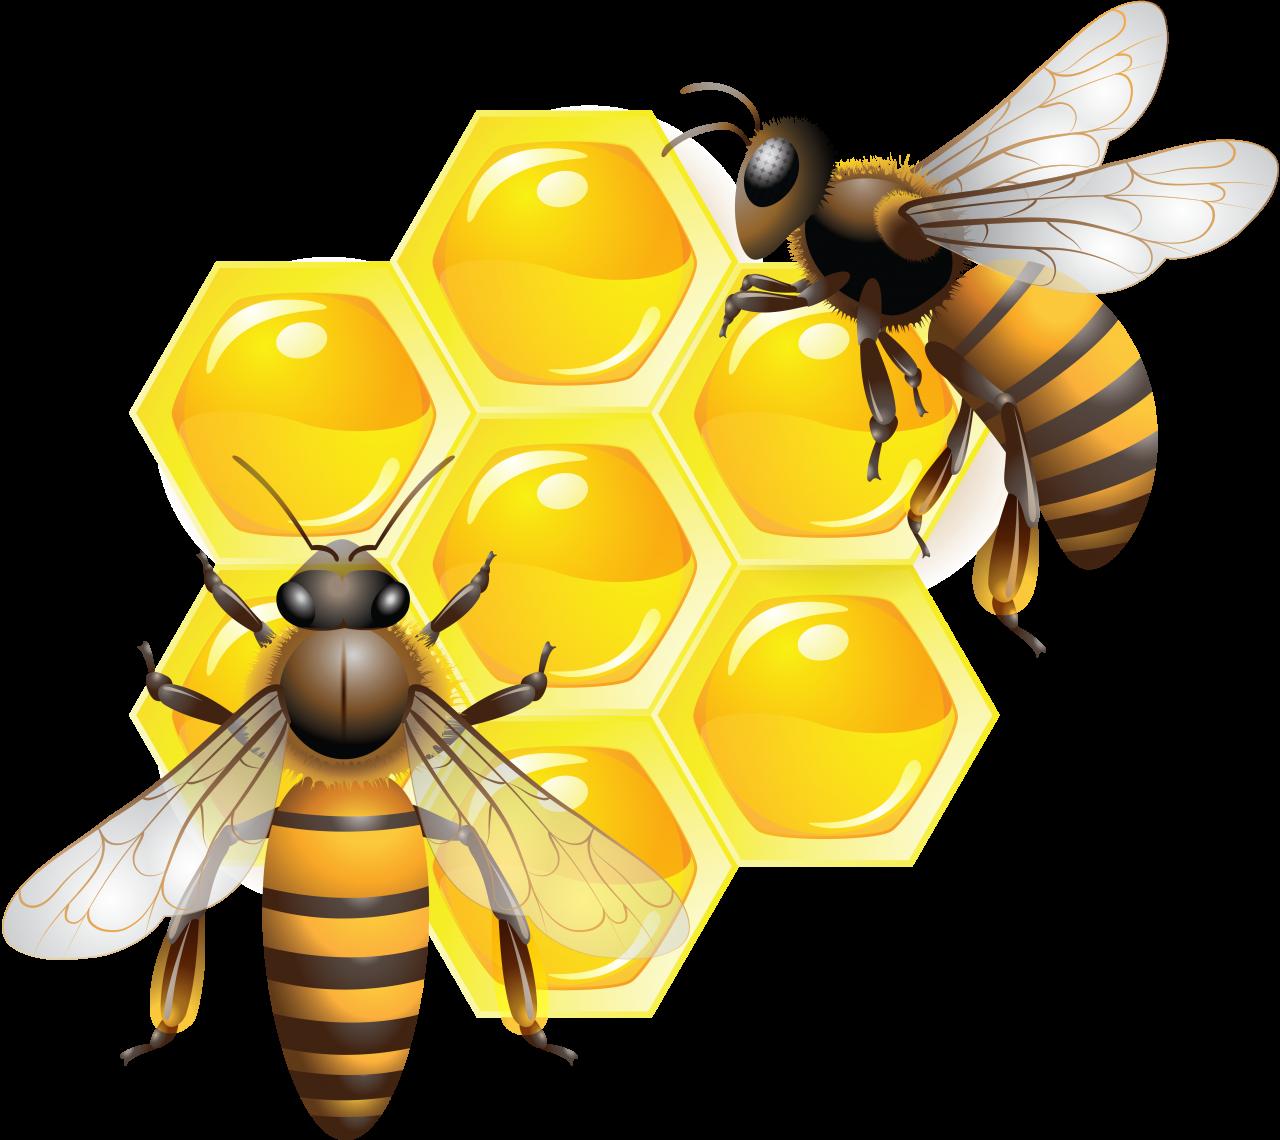 Honey PNG Image - PurePNG | Free transparent CC0 PNG Image ...